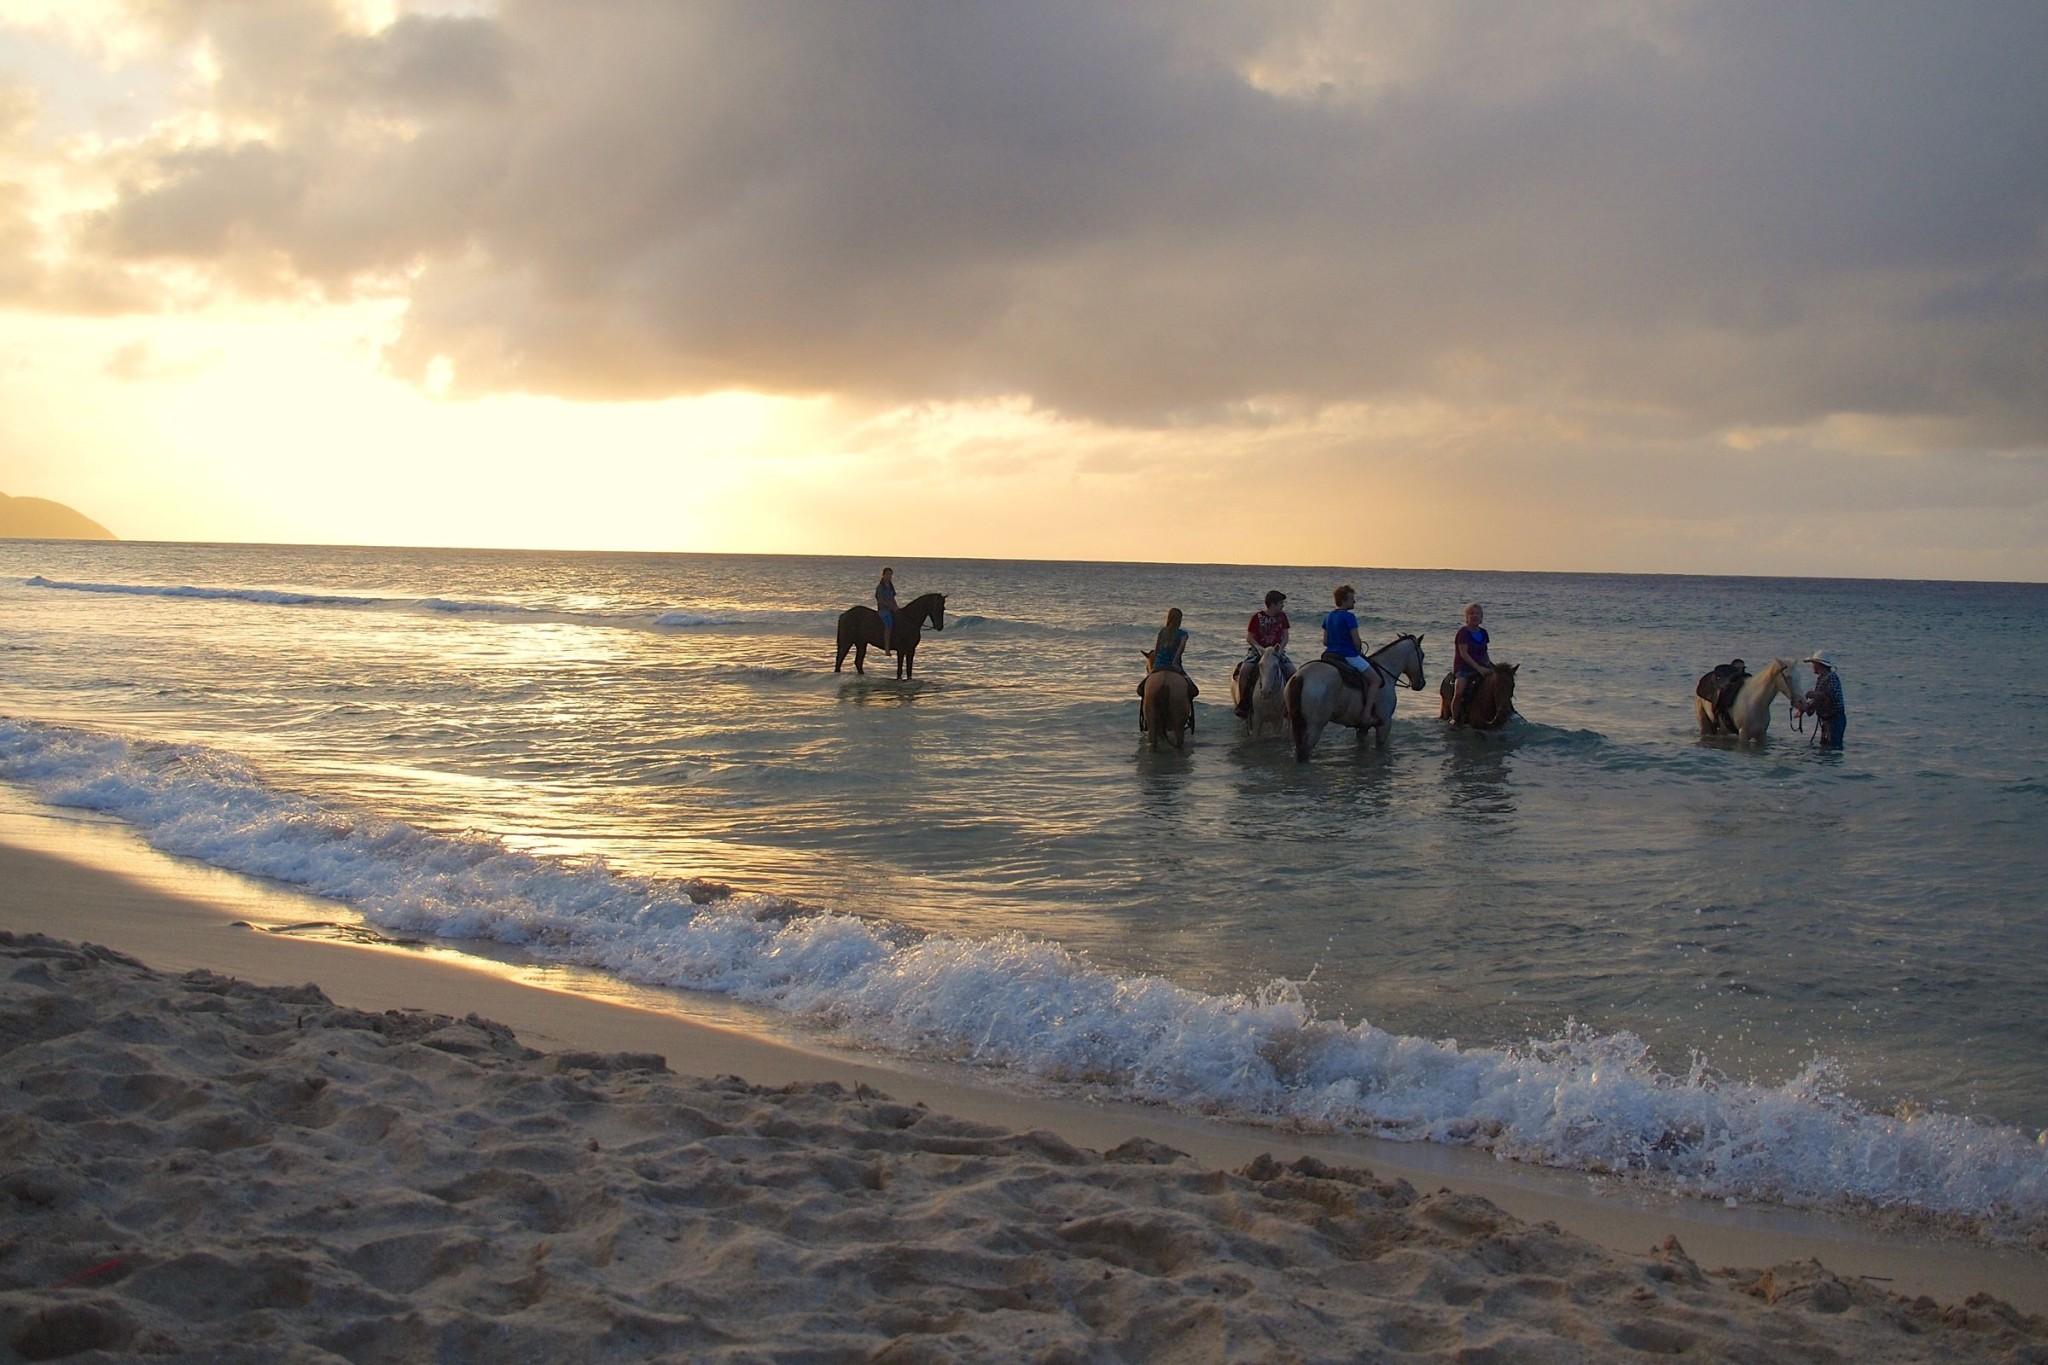 Horseback Riding Into the St. Croix Sea with Cowboy Steve: Uncommon Envy